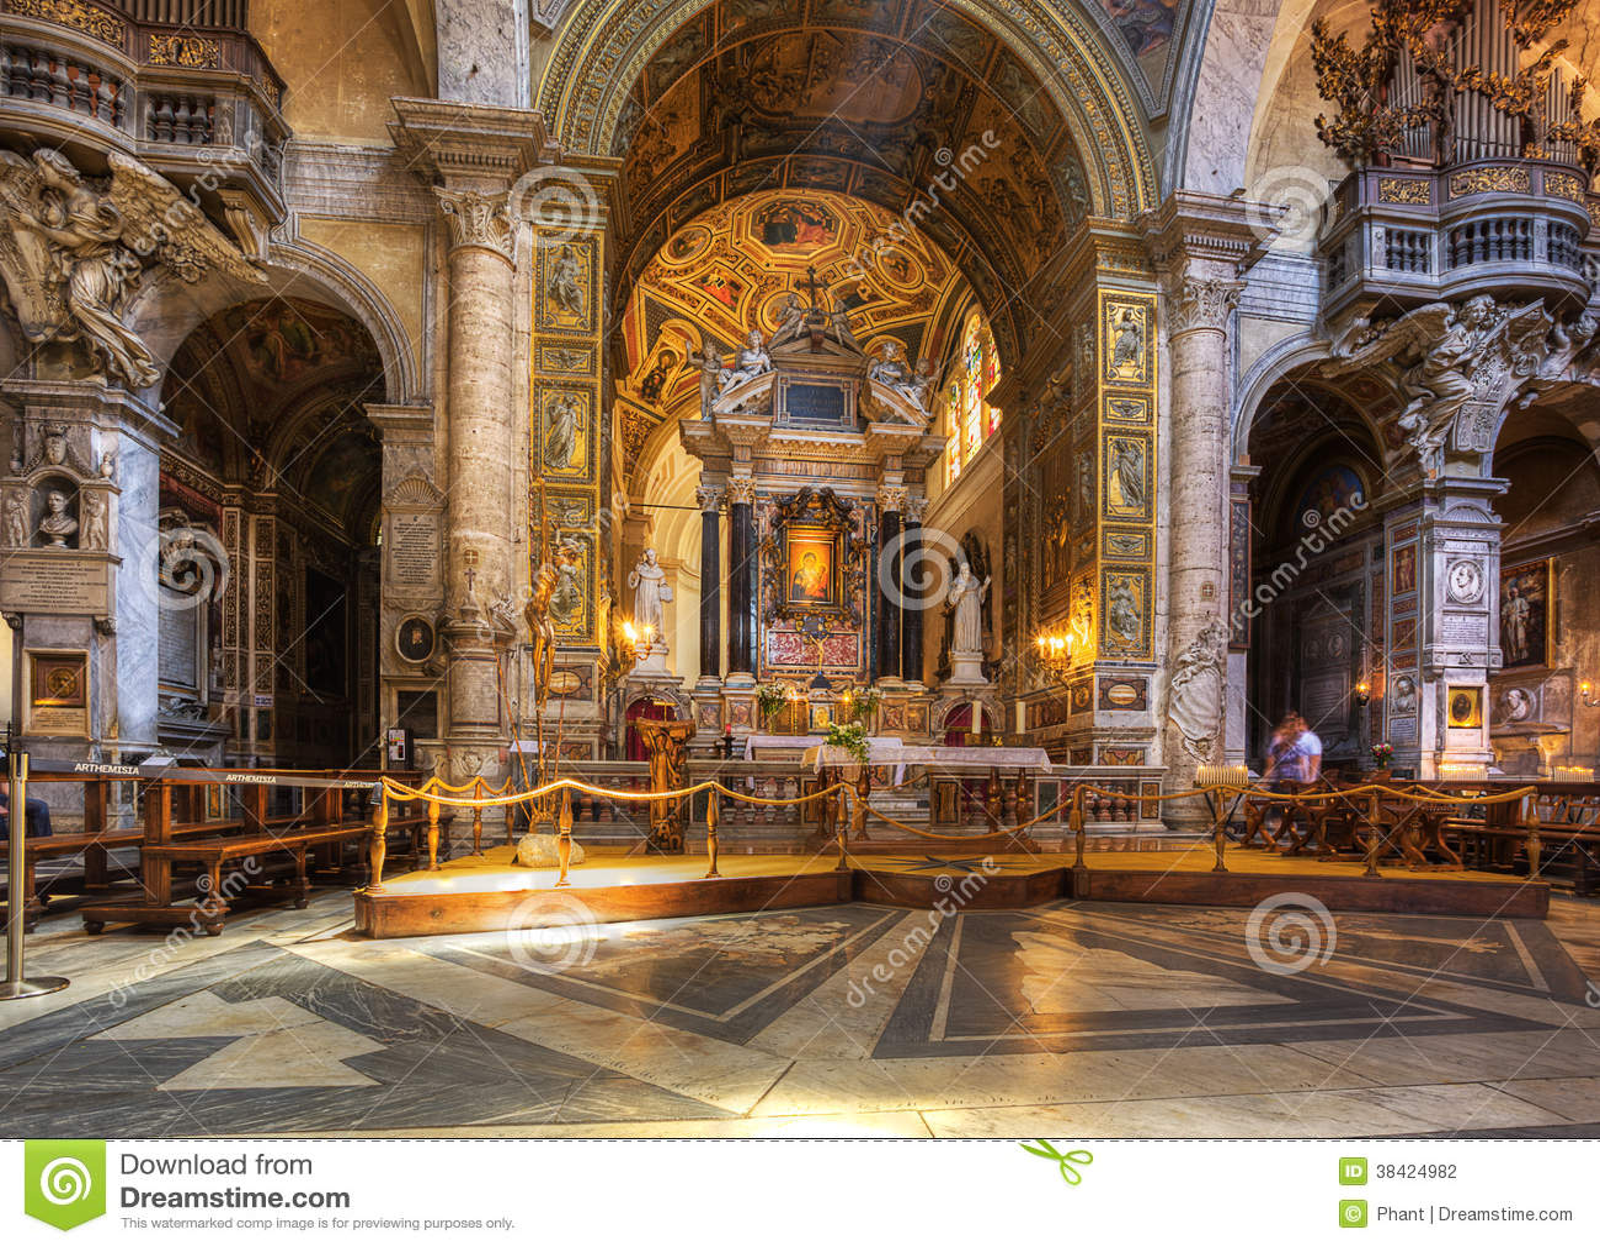 Interior of santa maria del popolo church stock photography image